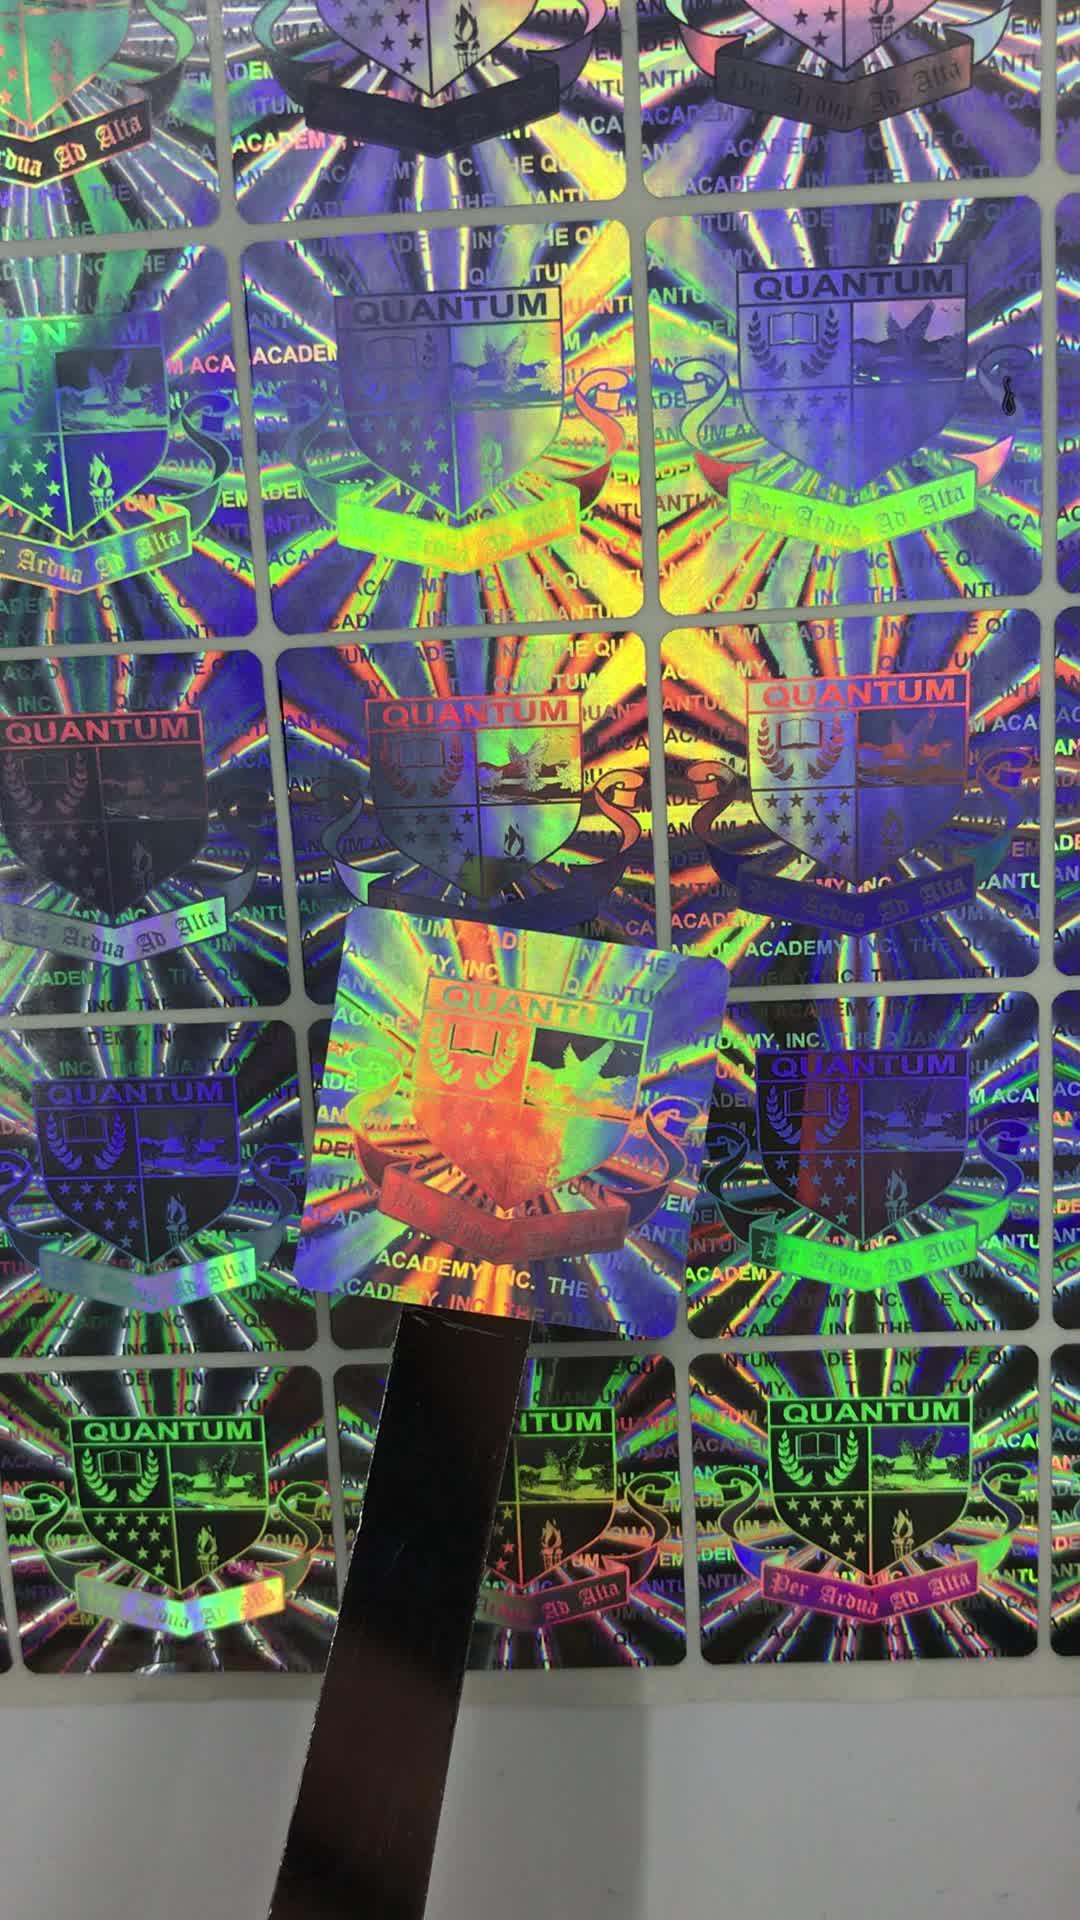 Silver sticker 3D one self-destroyed hologram custom holograms self-destroyed holograms,ipad 2 hologram